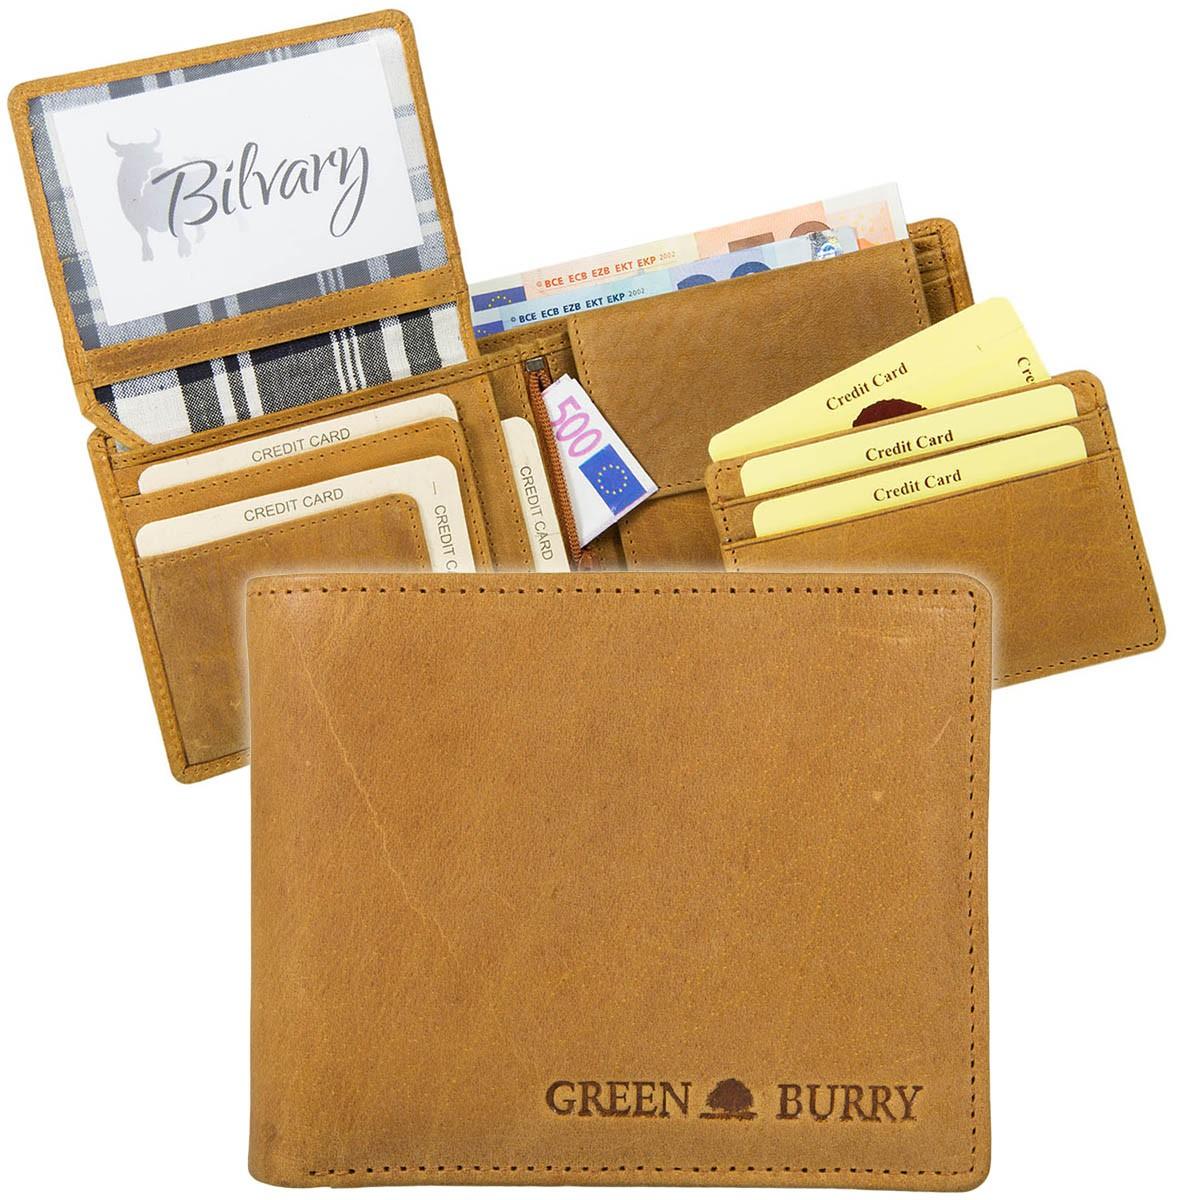 Greenburry Buffalo Chromefree Leder Geldbörse Portmonee 1986-24